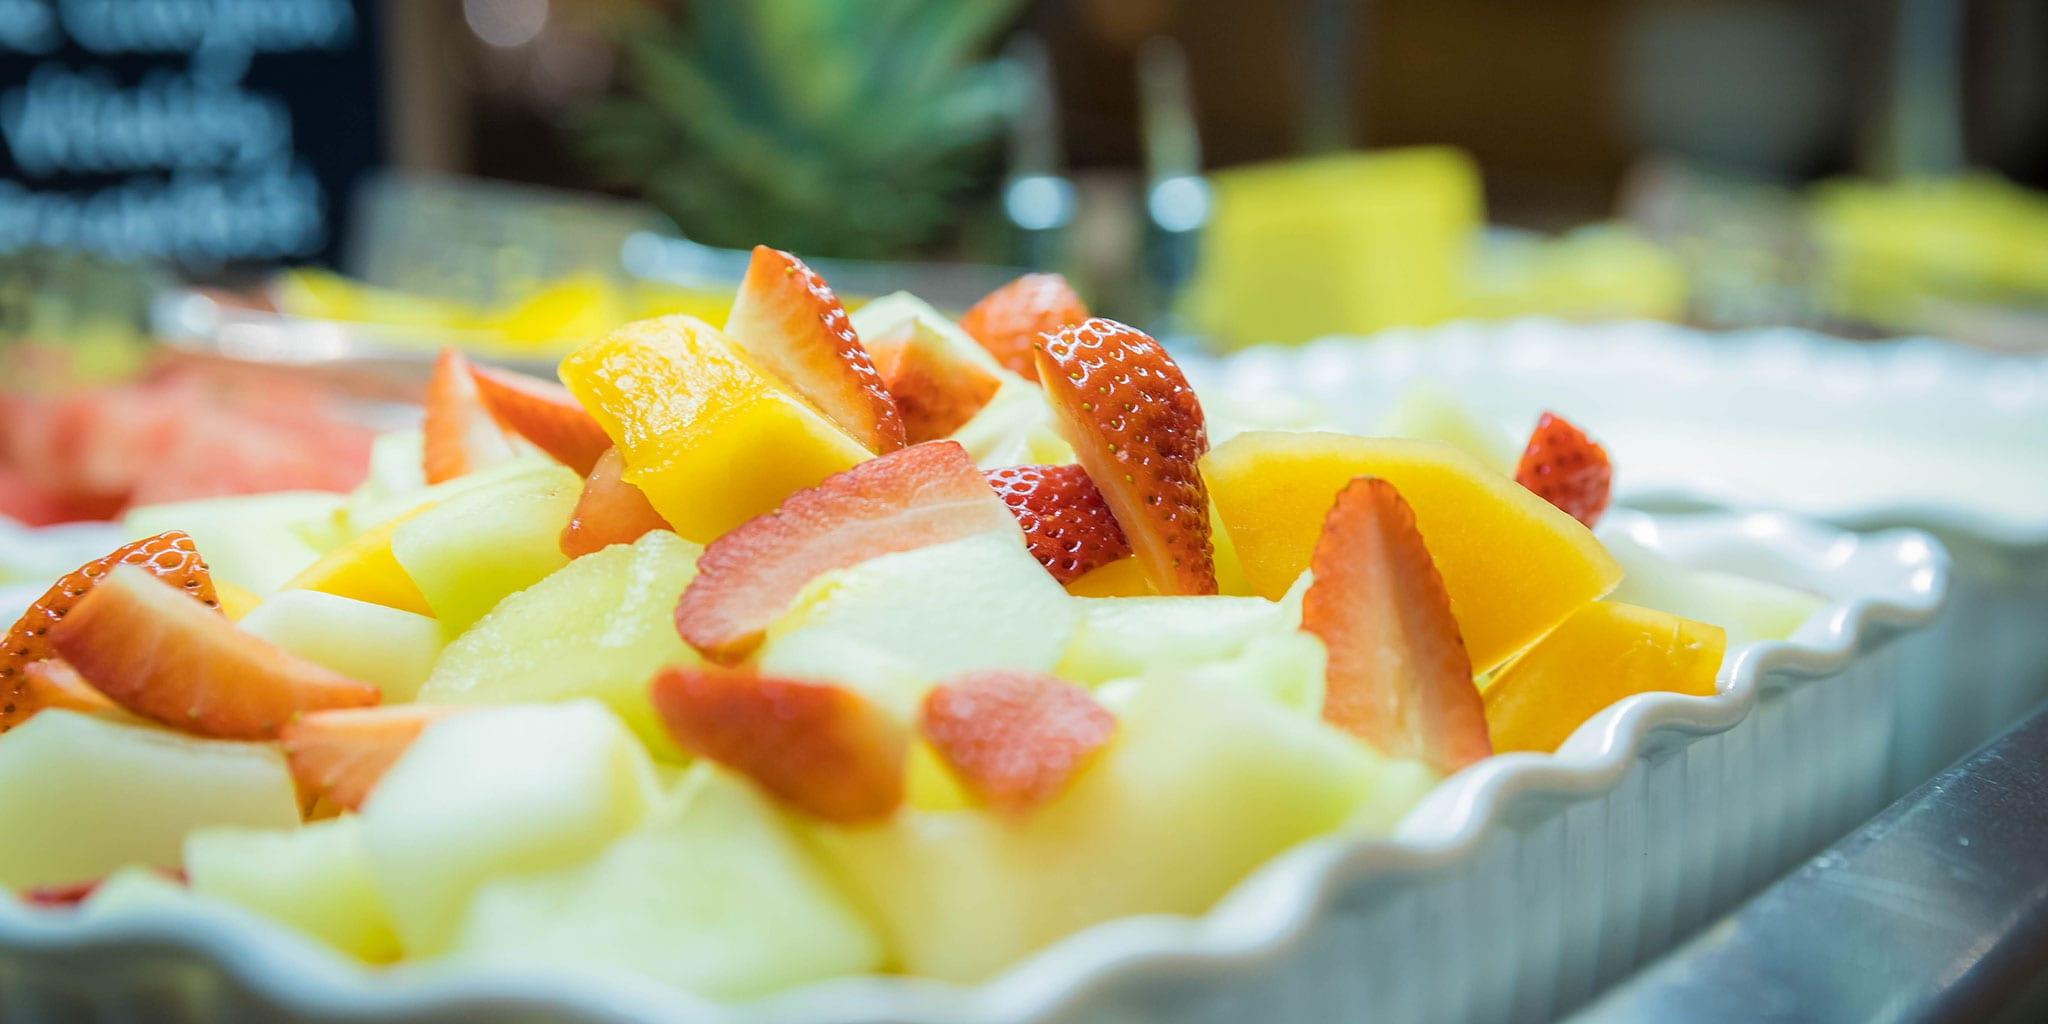 Breakfast-Buffet-Fruit-Clayton-Cardiff-Lane